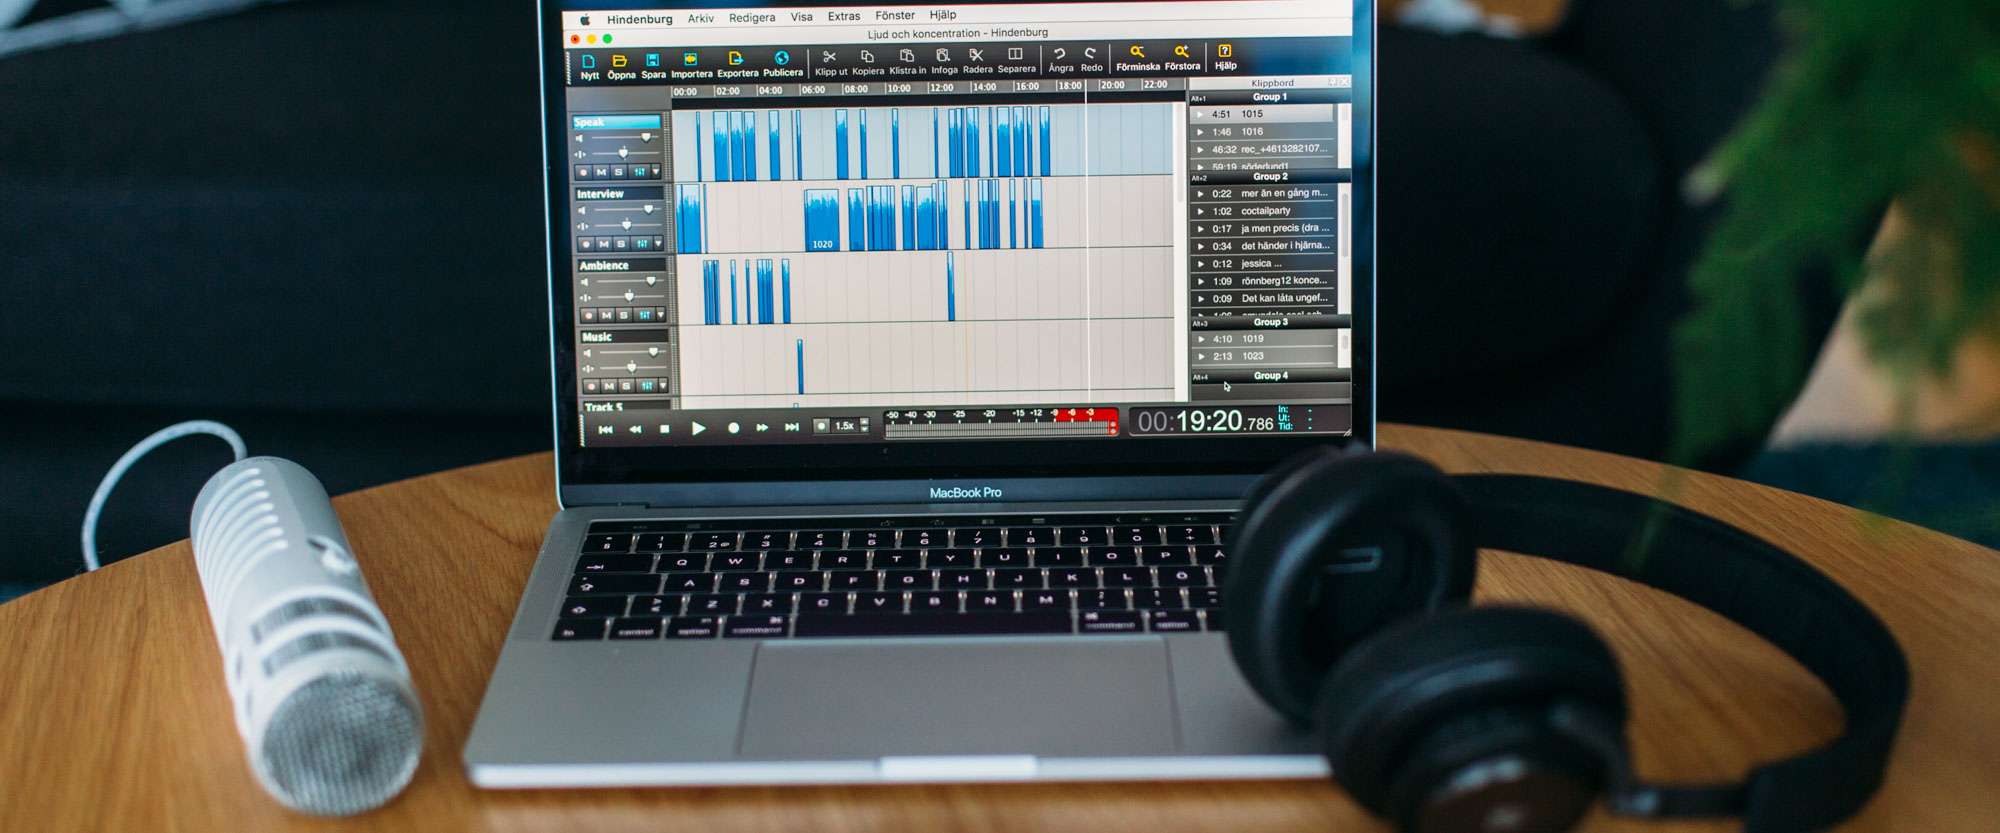 Onlinekurs Redigera din podcast i Hindenburg